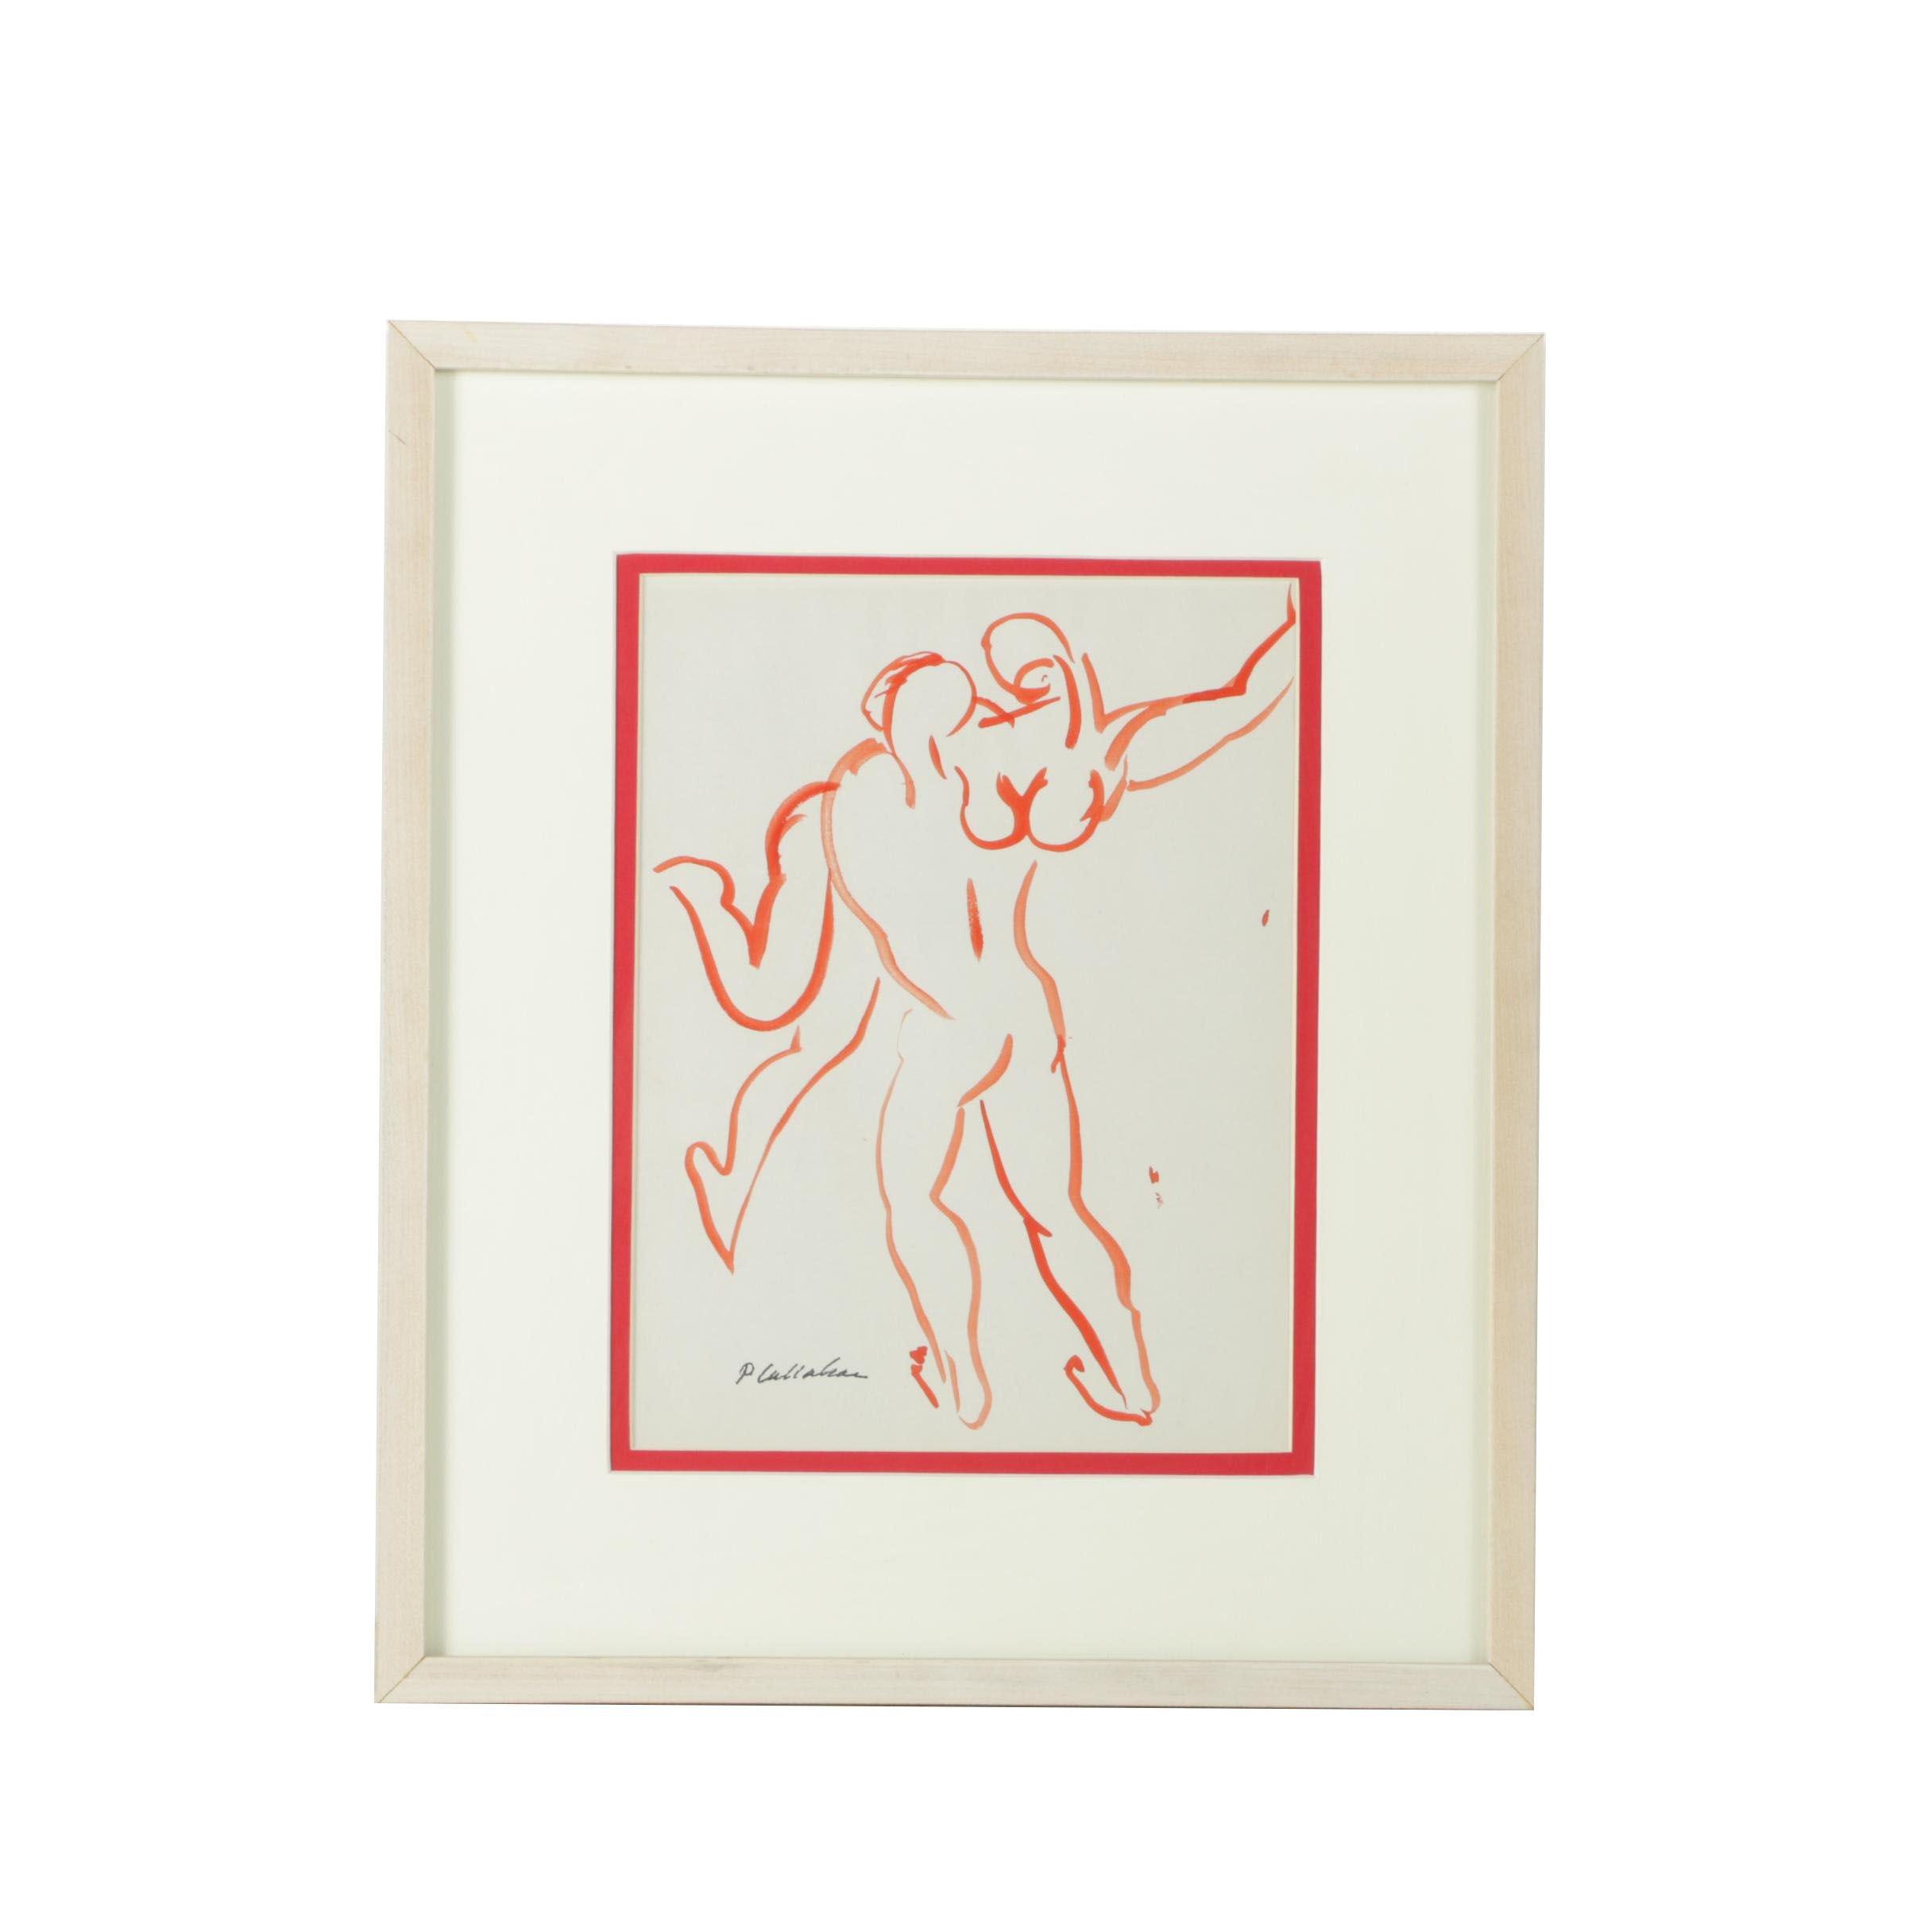 Phillip Callahan Watercolor of Man and Woman